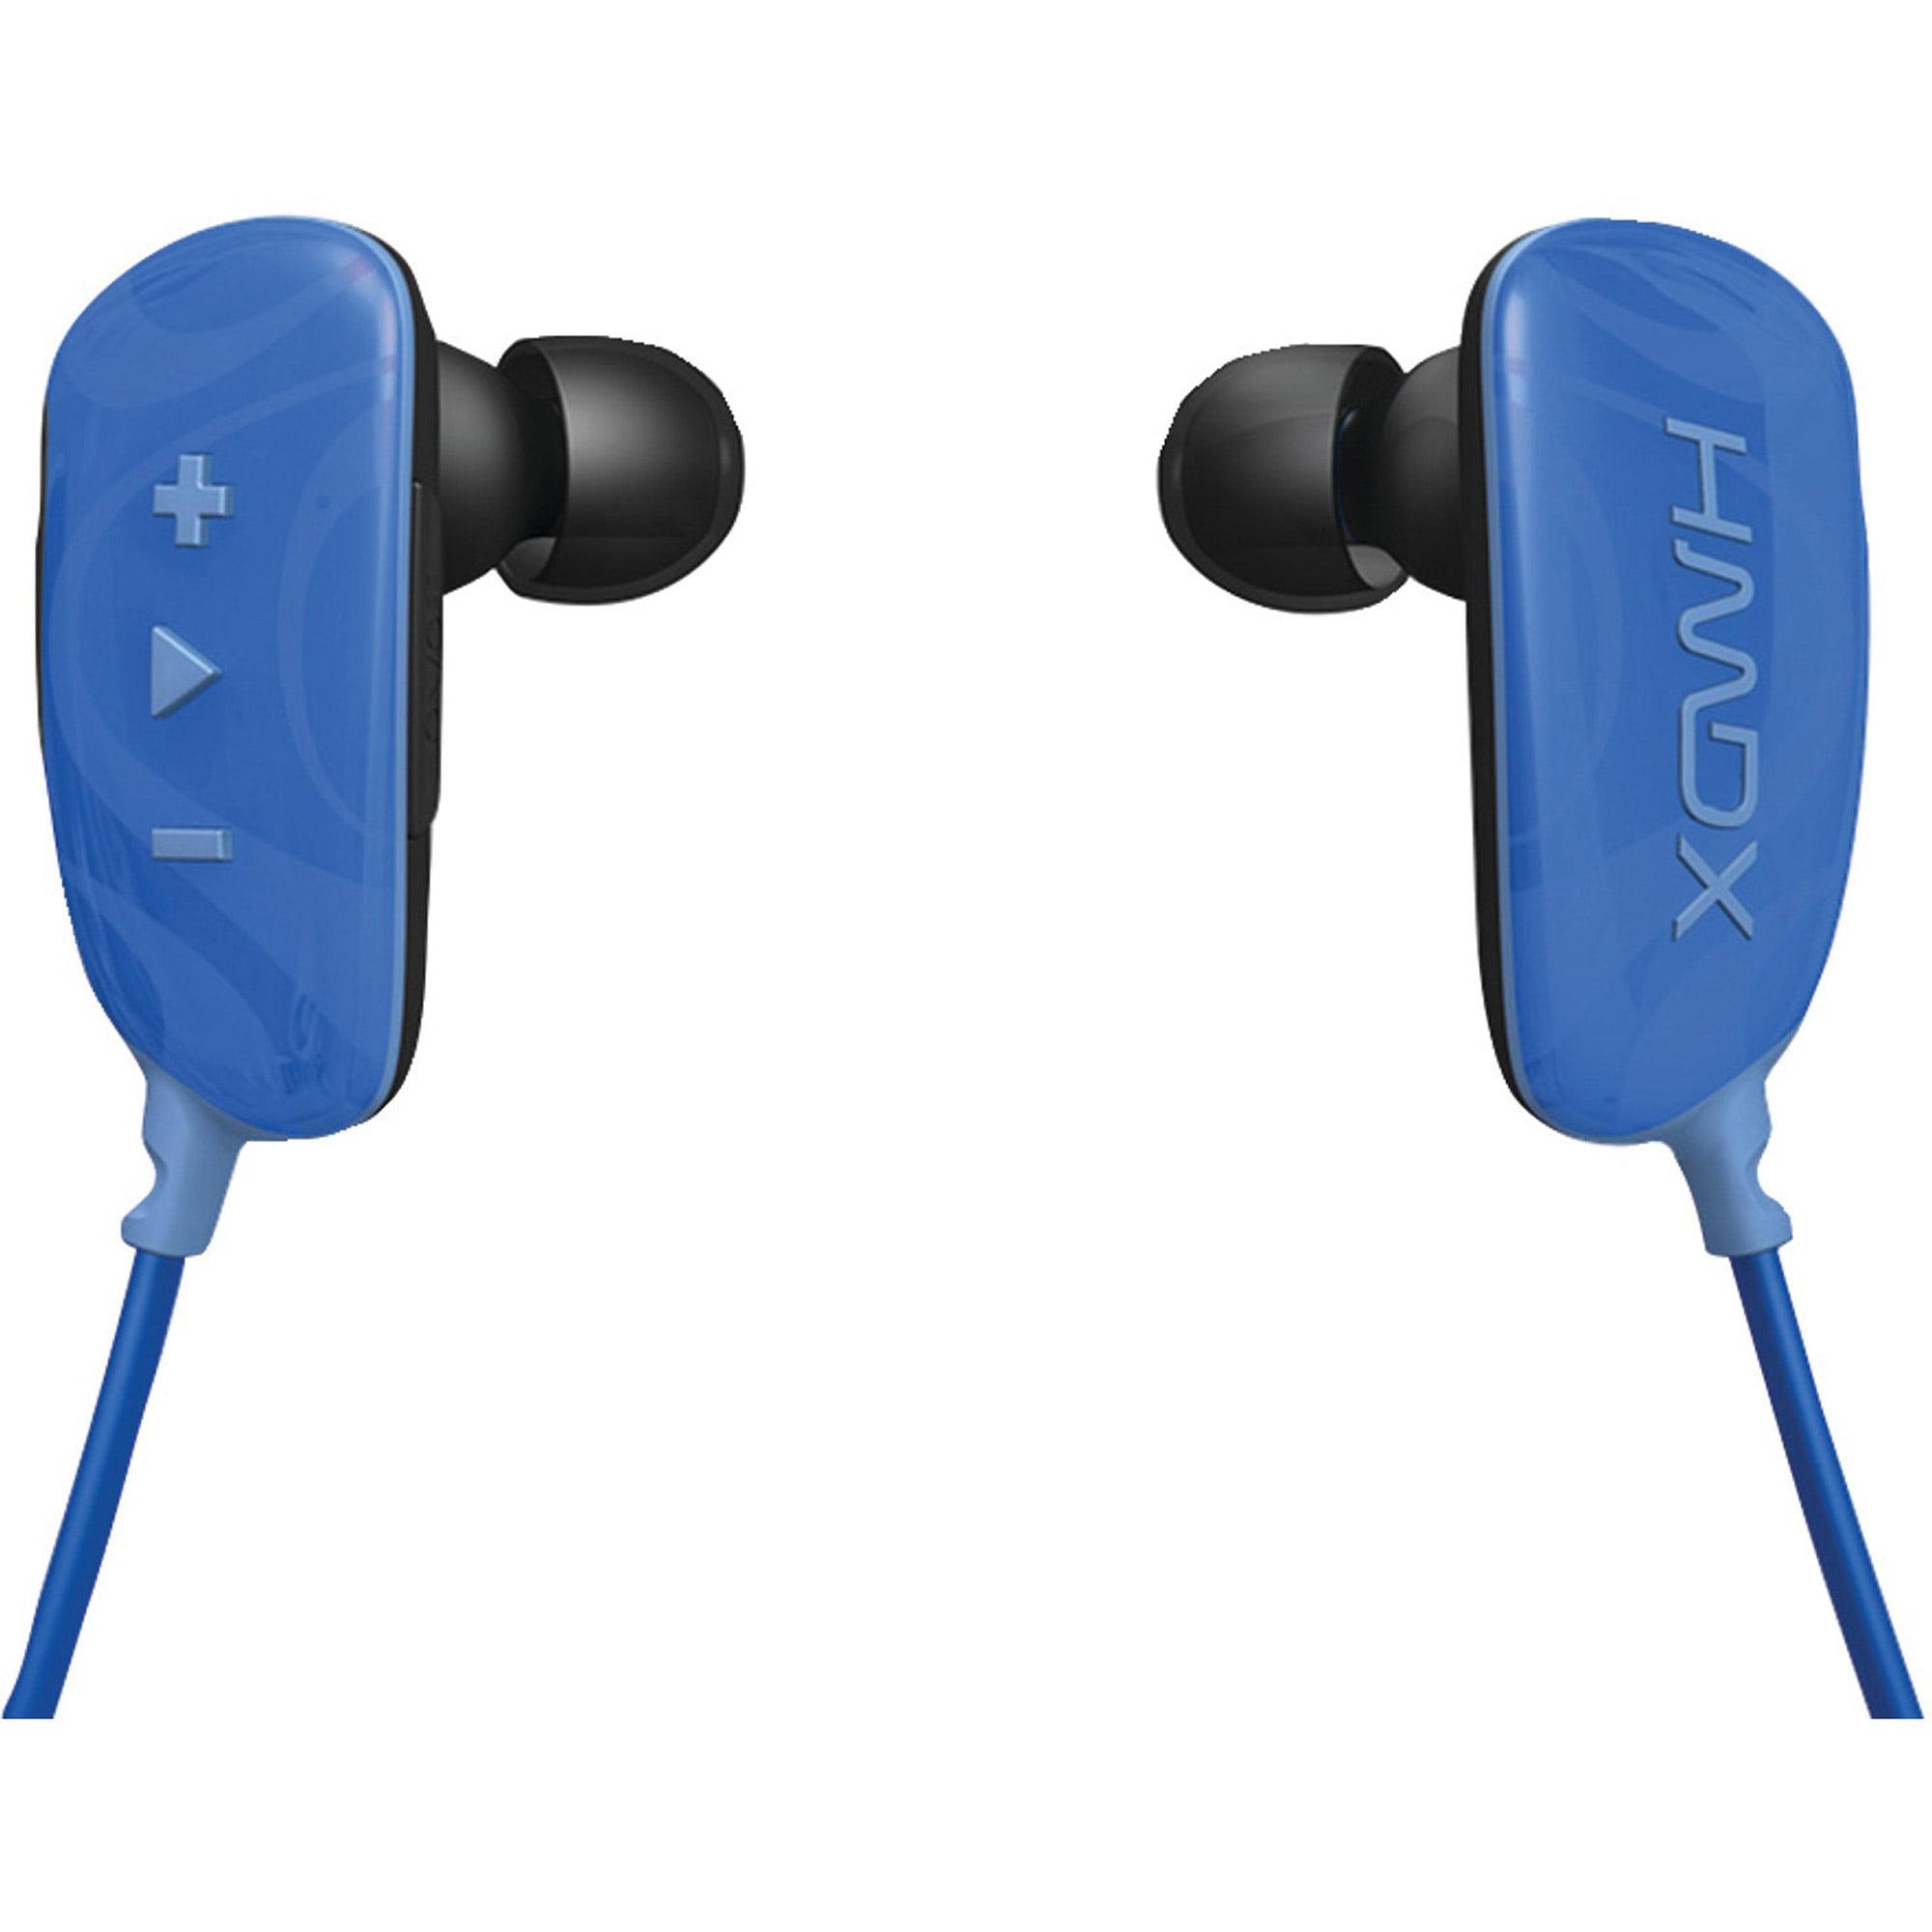 HMDX HX-EP250BL Craze Bluetooth Earbuds